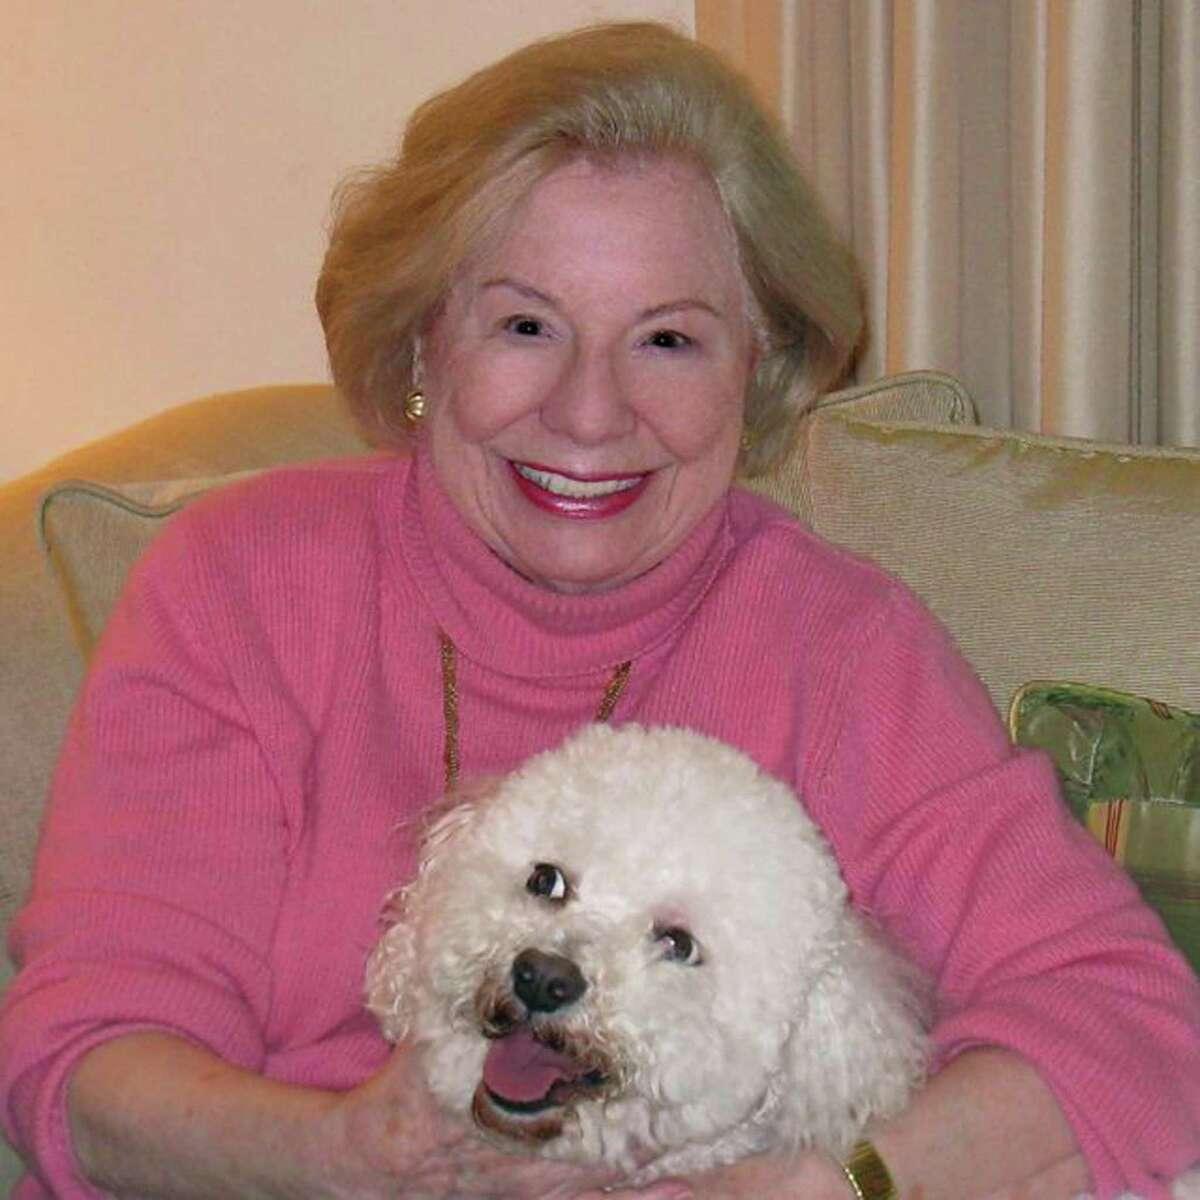 Greenwich author and newspaper columnist Carla Wallach